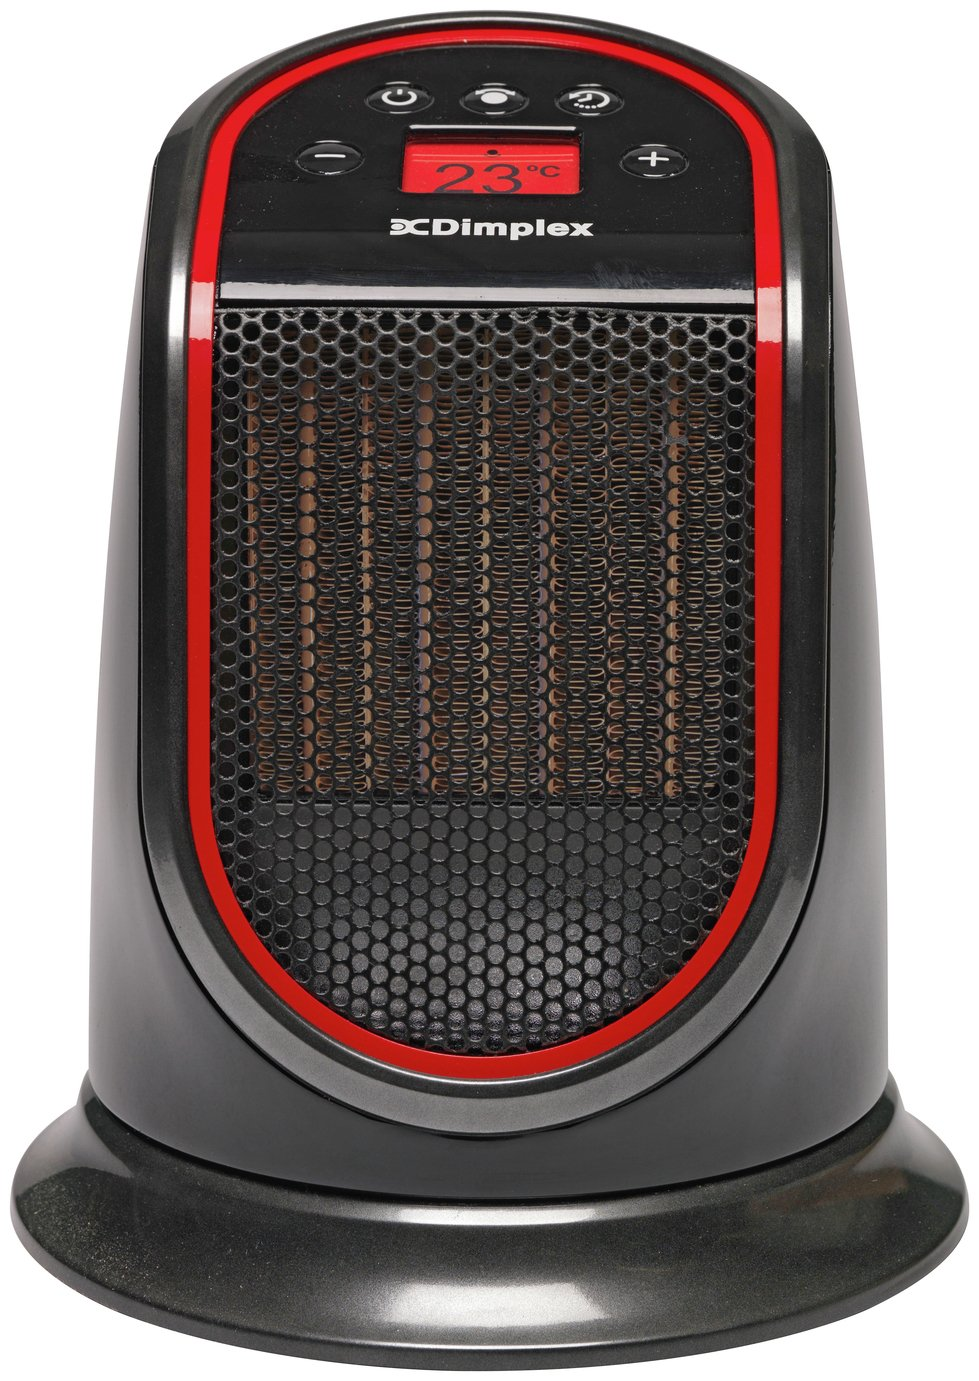 Dimplex M2gts Oscillating Ceramic Heater